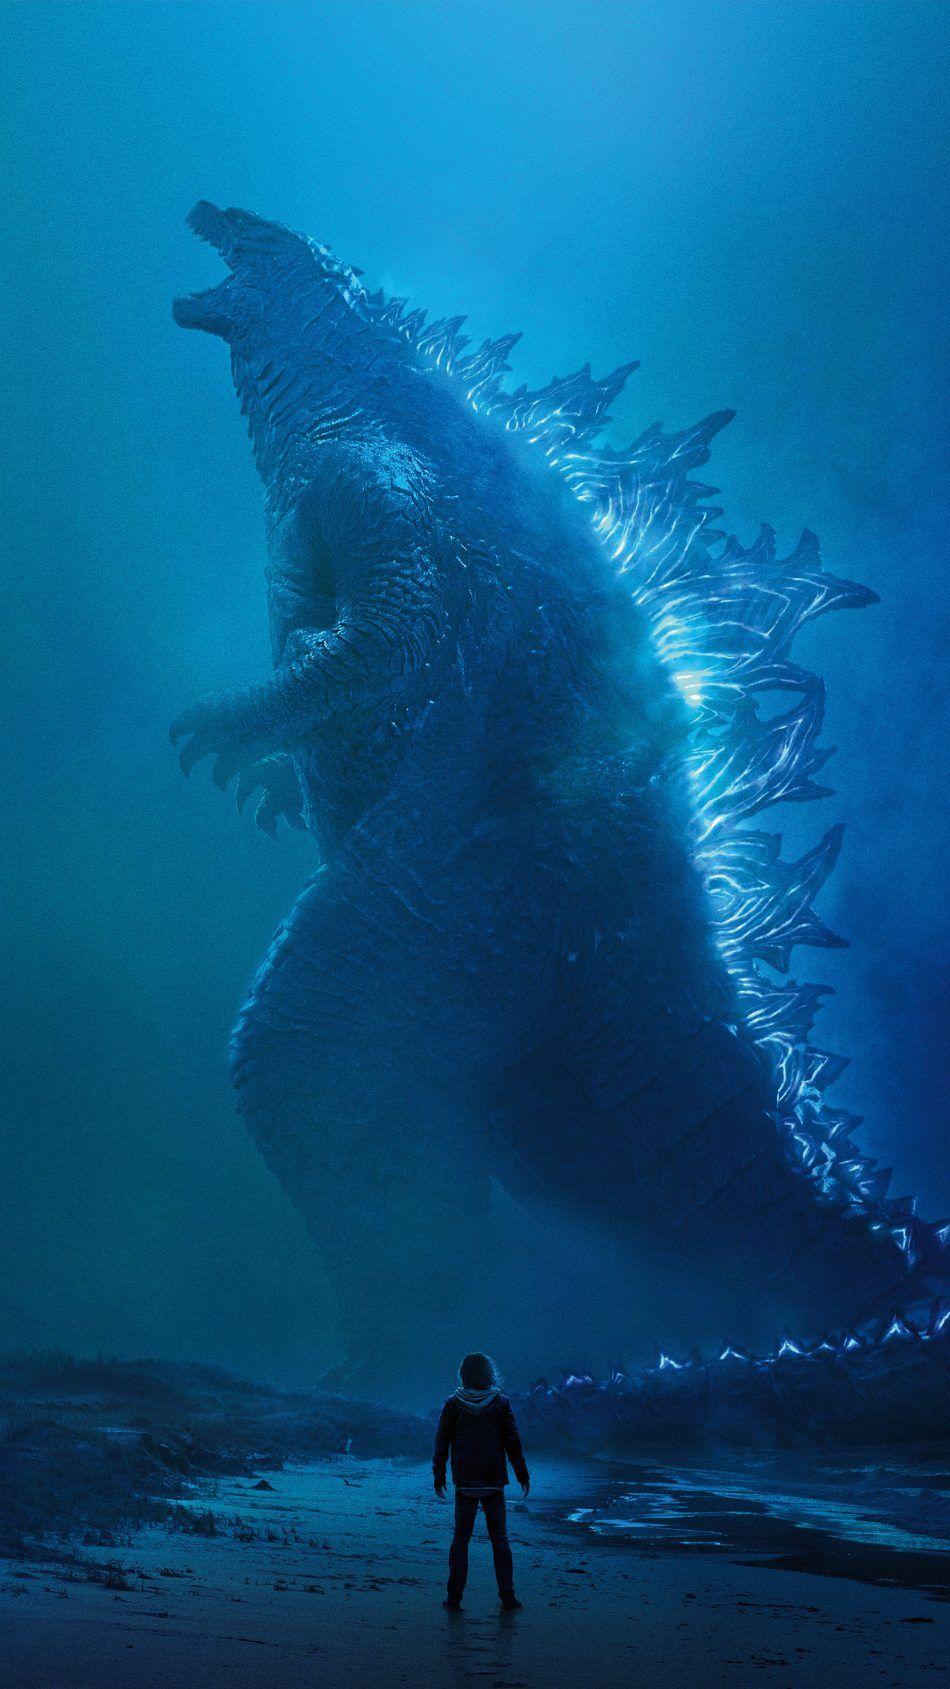 Godzilla King Of The Monsters 2019 Godzilla Wallpaper All